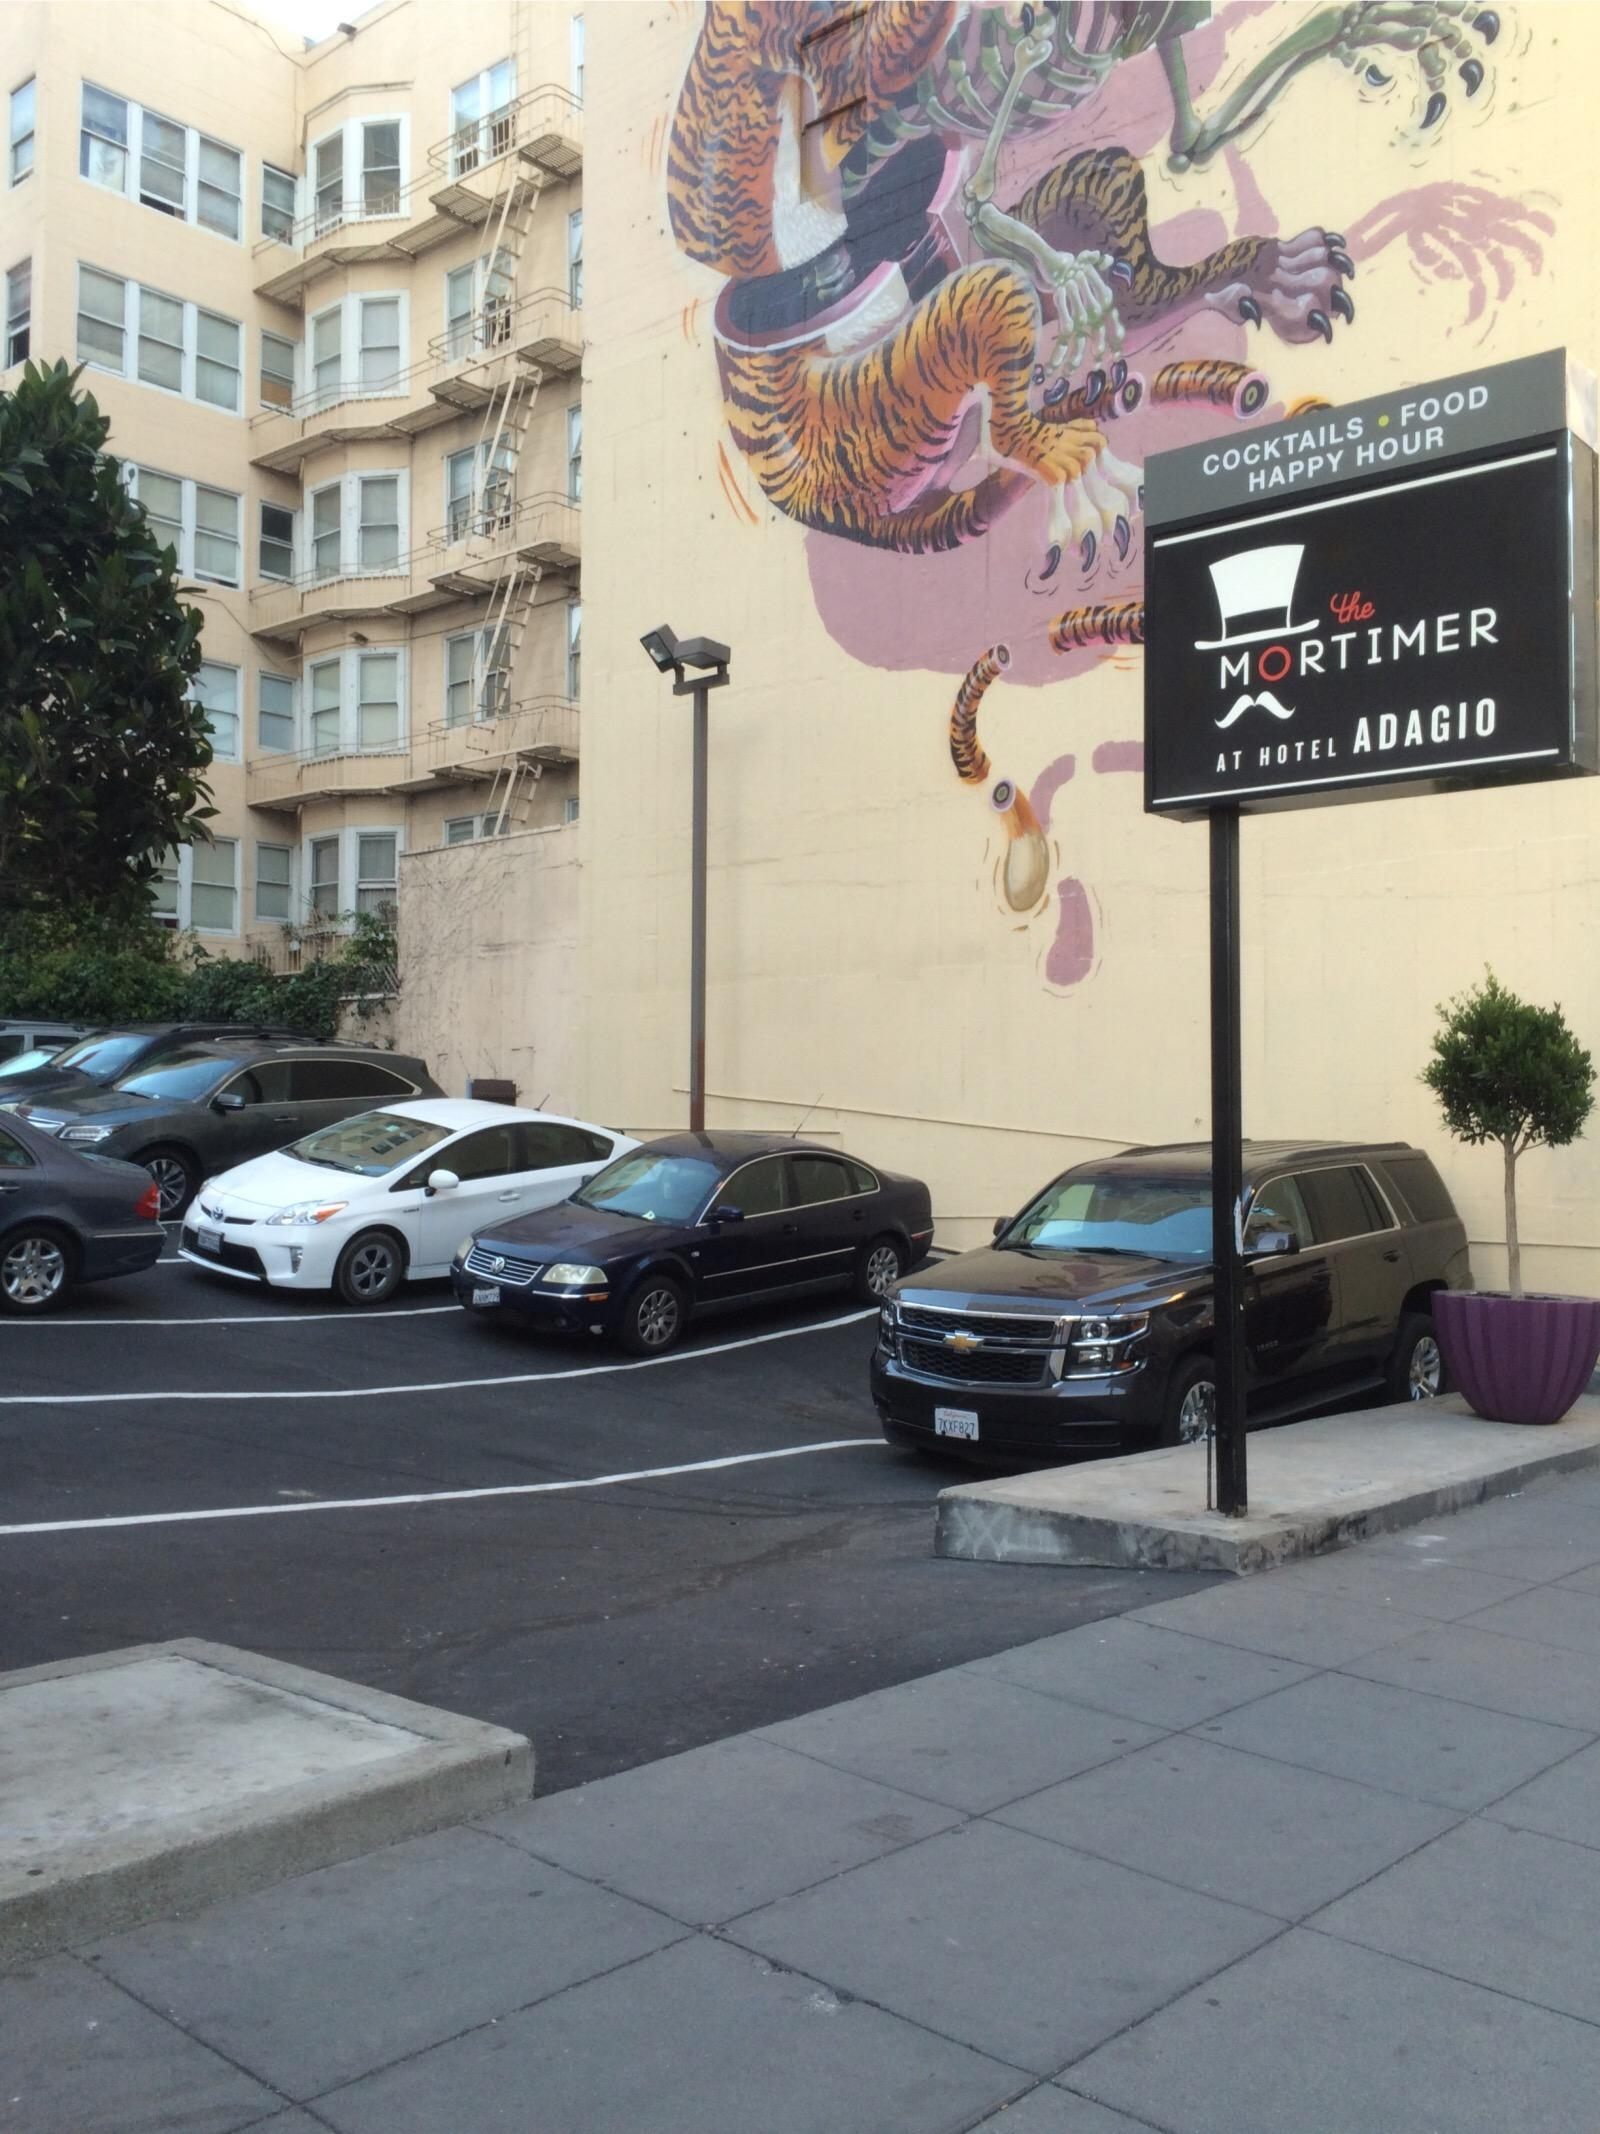 Hotel adagio parking in san francisco parkme for Reservation hotel adagio